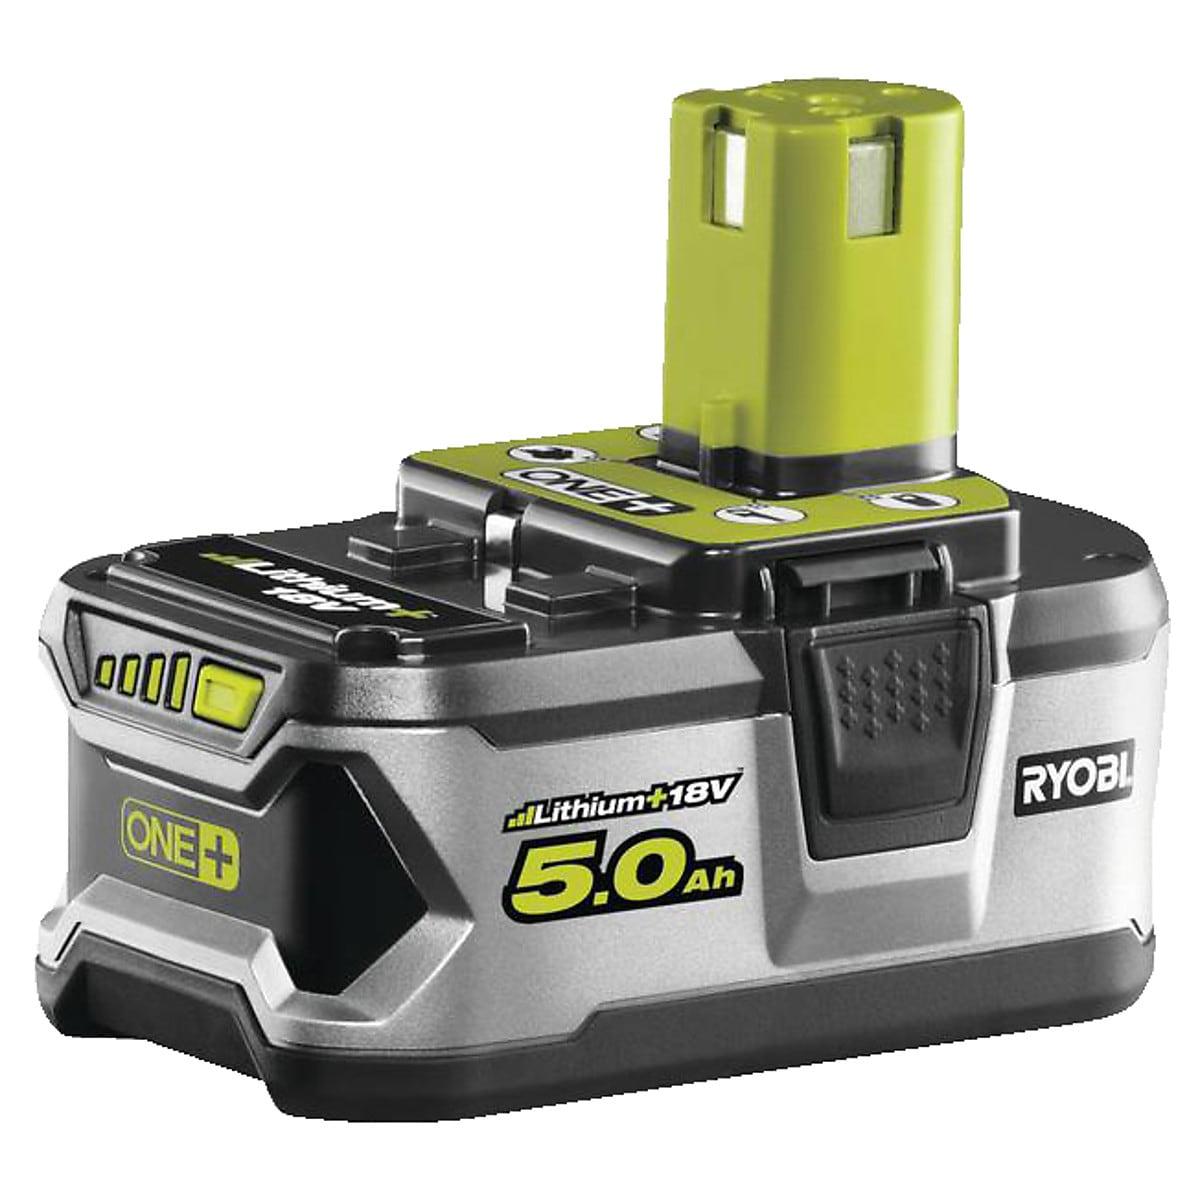 Ryobi batteri  RB18L50